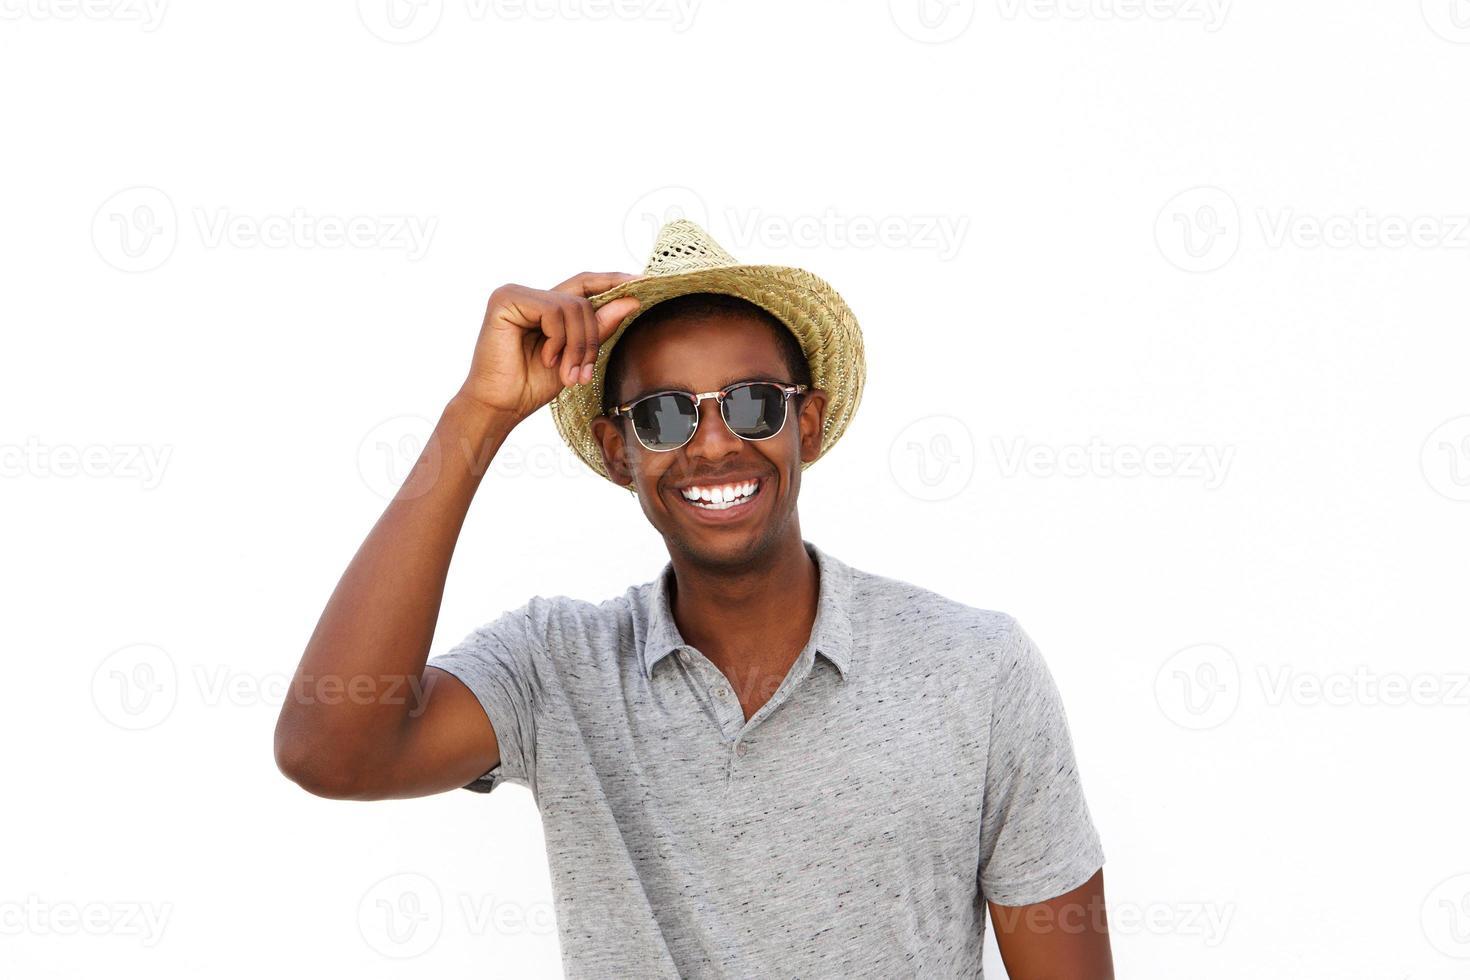 alegre cara afro-americana, sorrindo com chapéu e óculos de sol foto